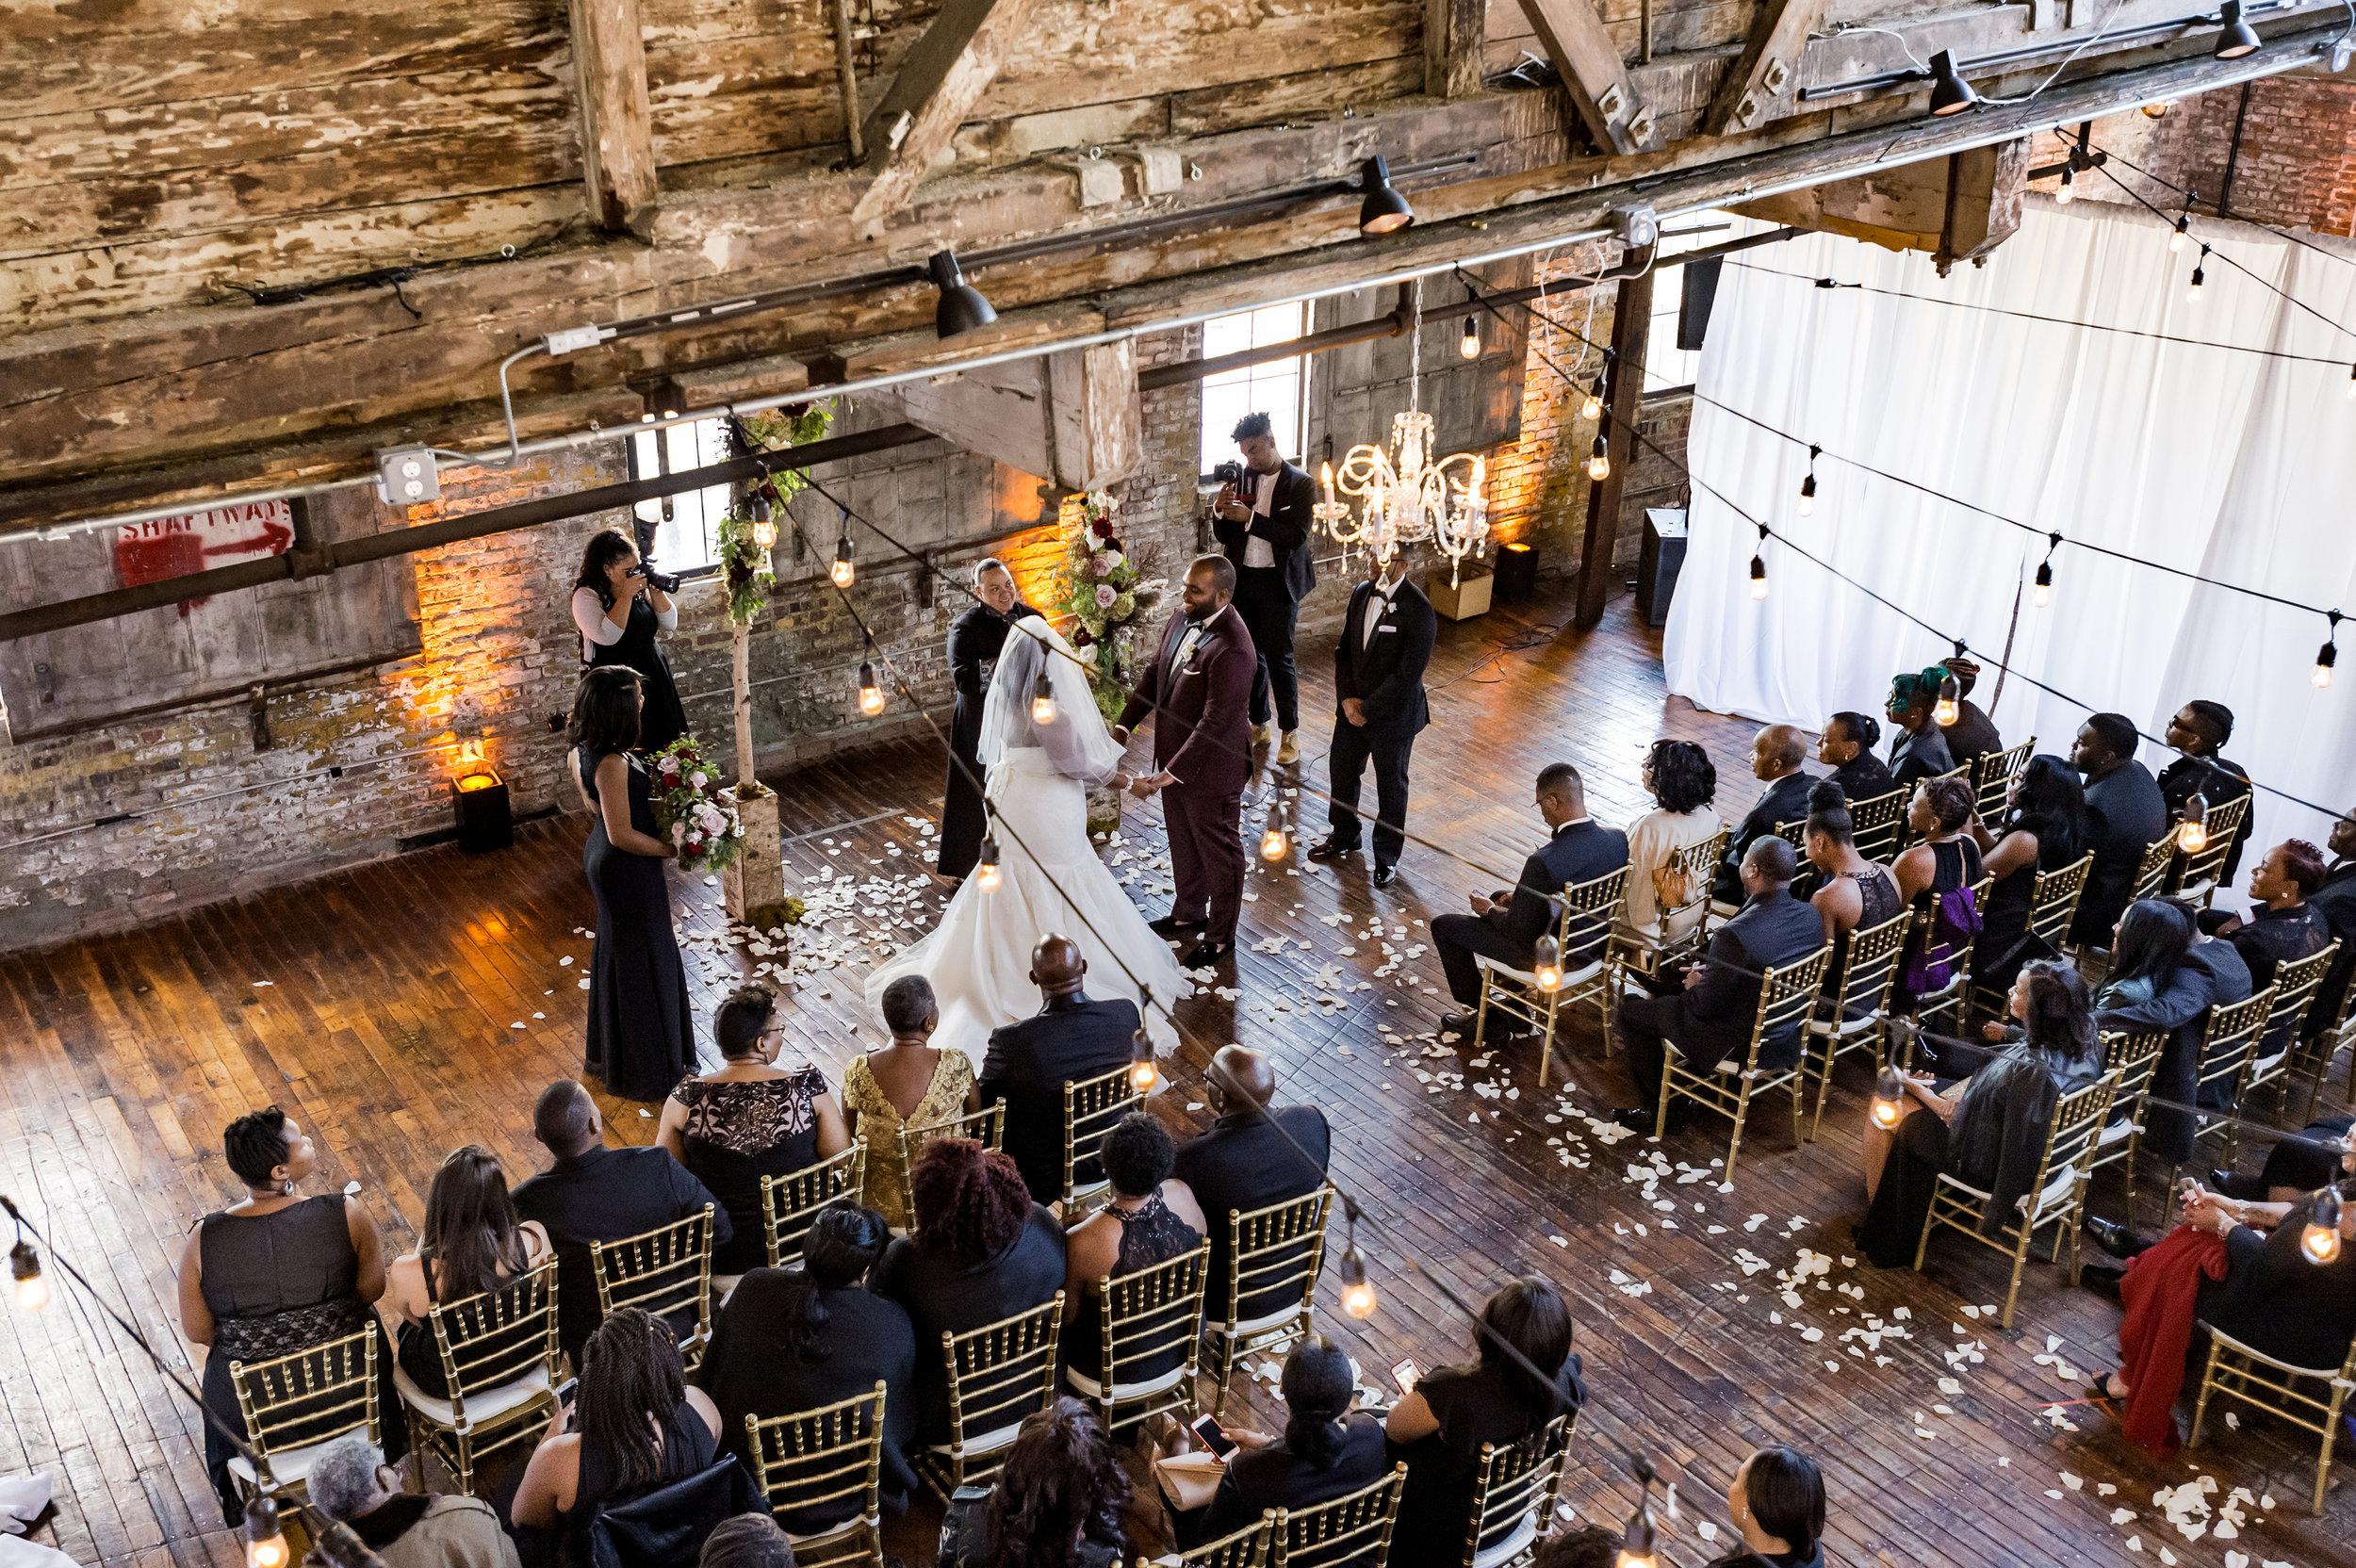 victorious-events-nyc-031-yanique-rondel-greenpoint-loft-wedding-amy-anaiz.jpg